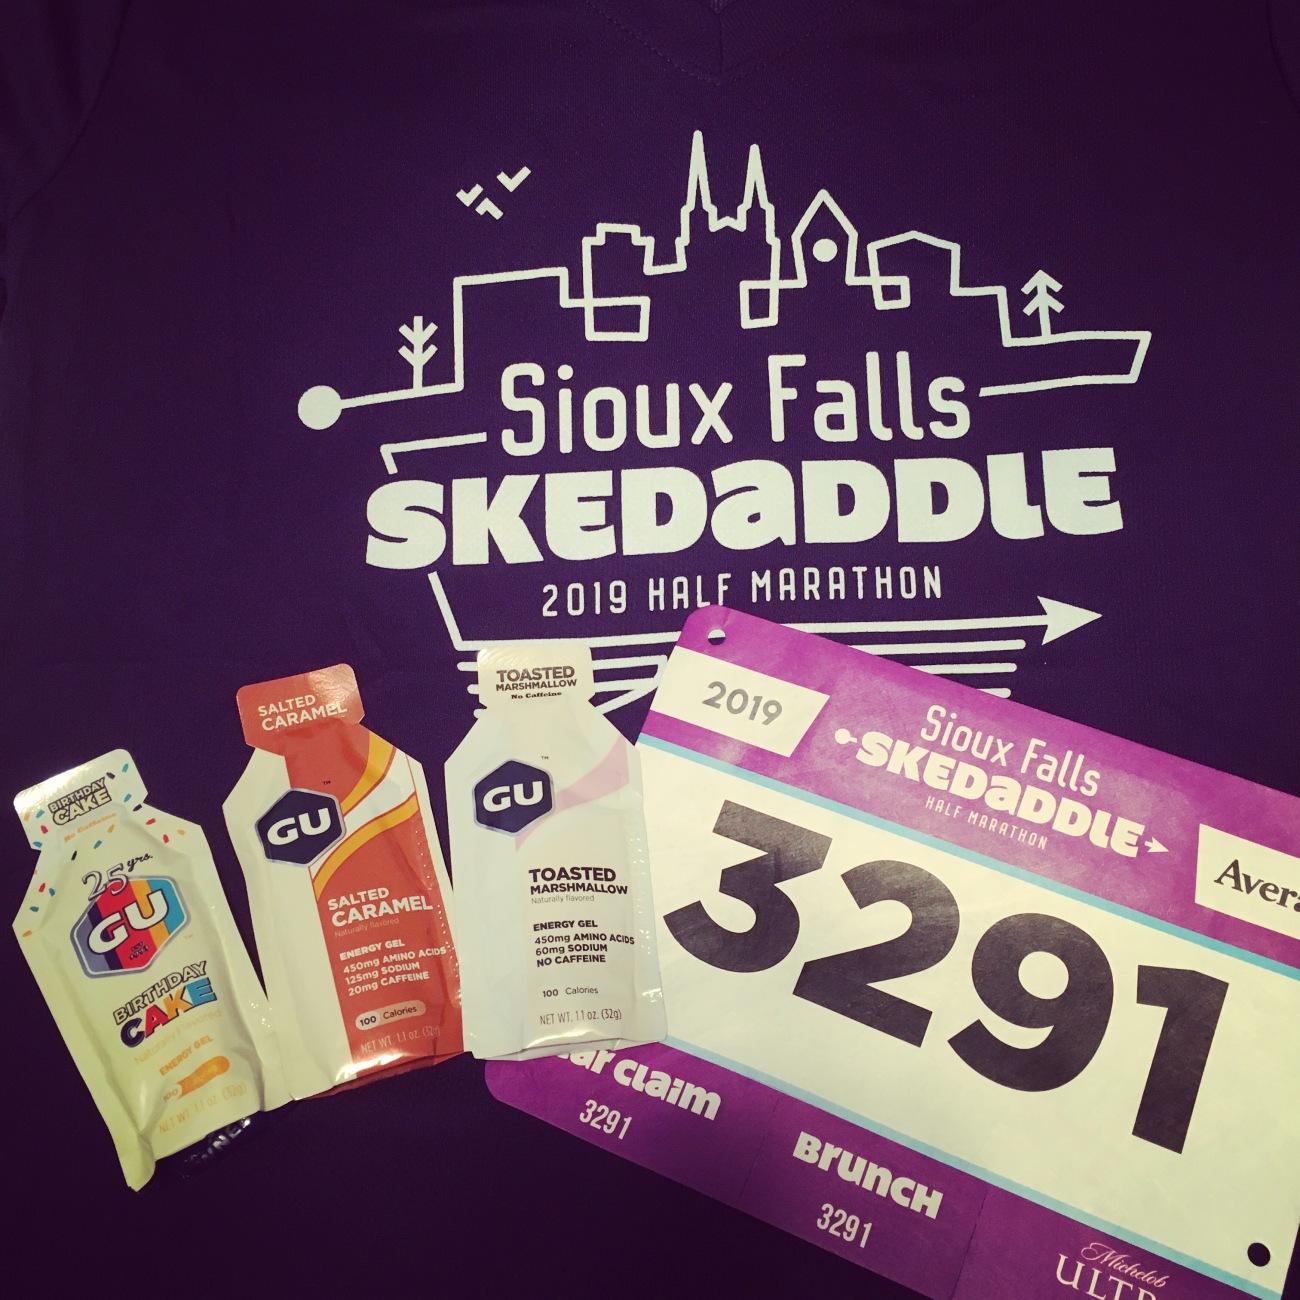 Sioux Falls Skedaddle Half Marathon 2019 - Prep